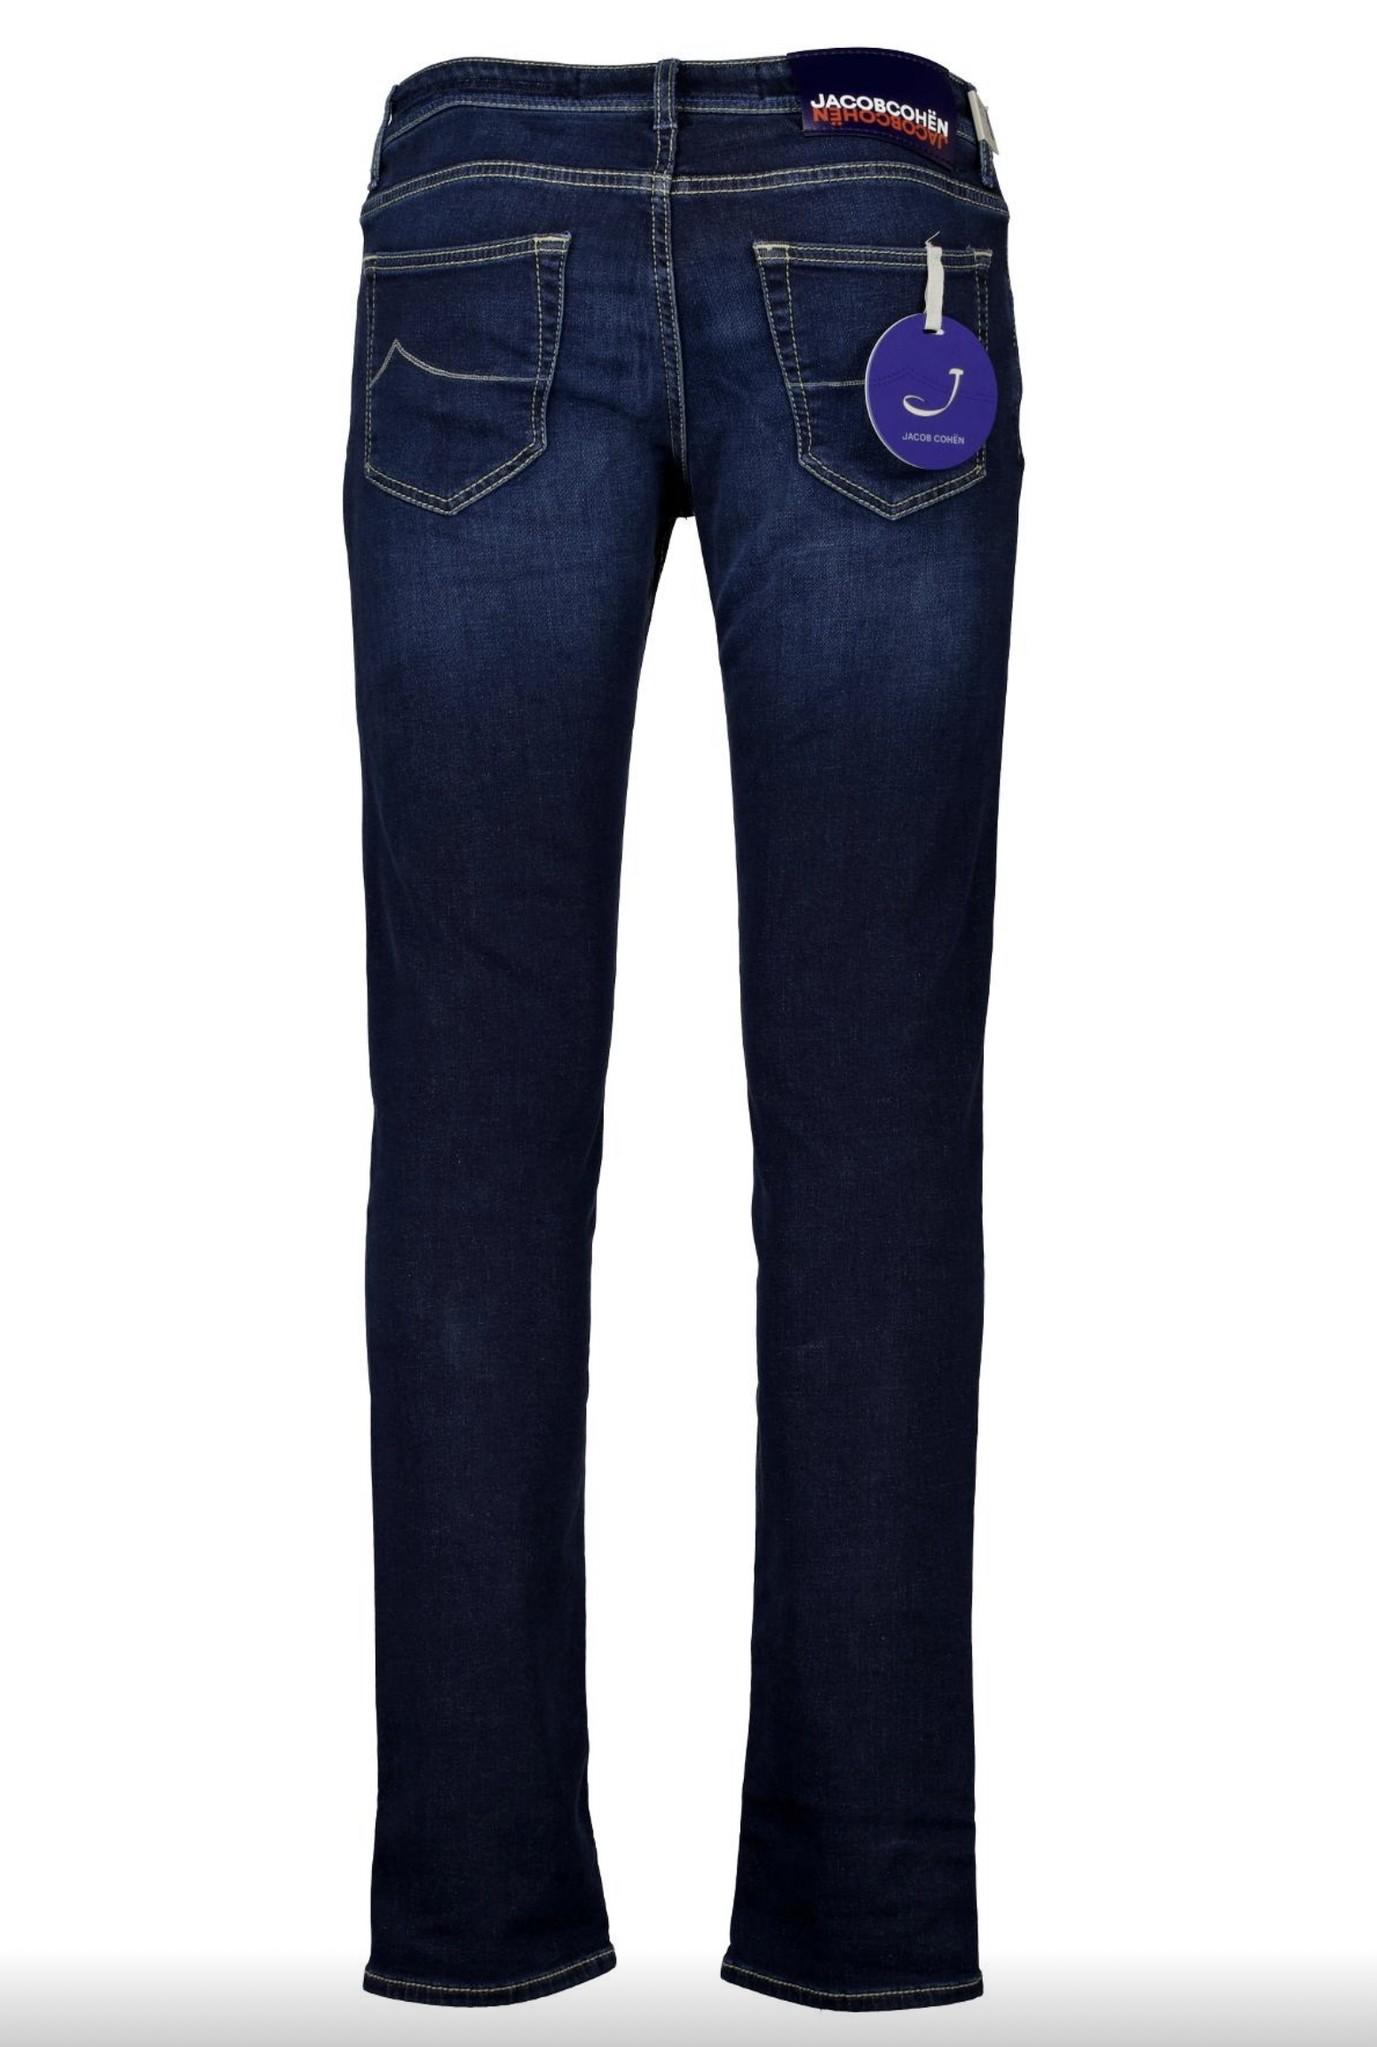 J622 Slim Jogging Comf Jeans-2